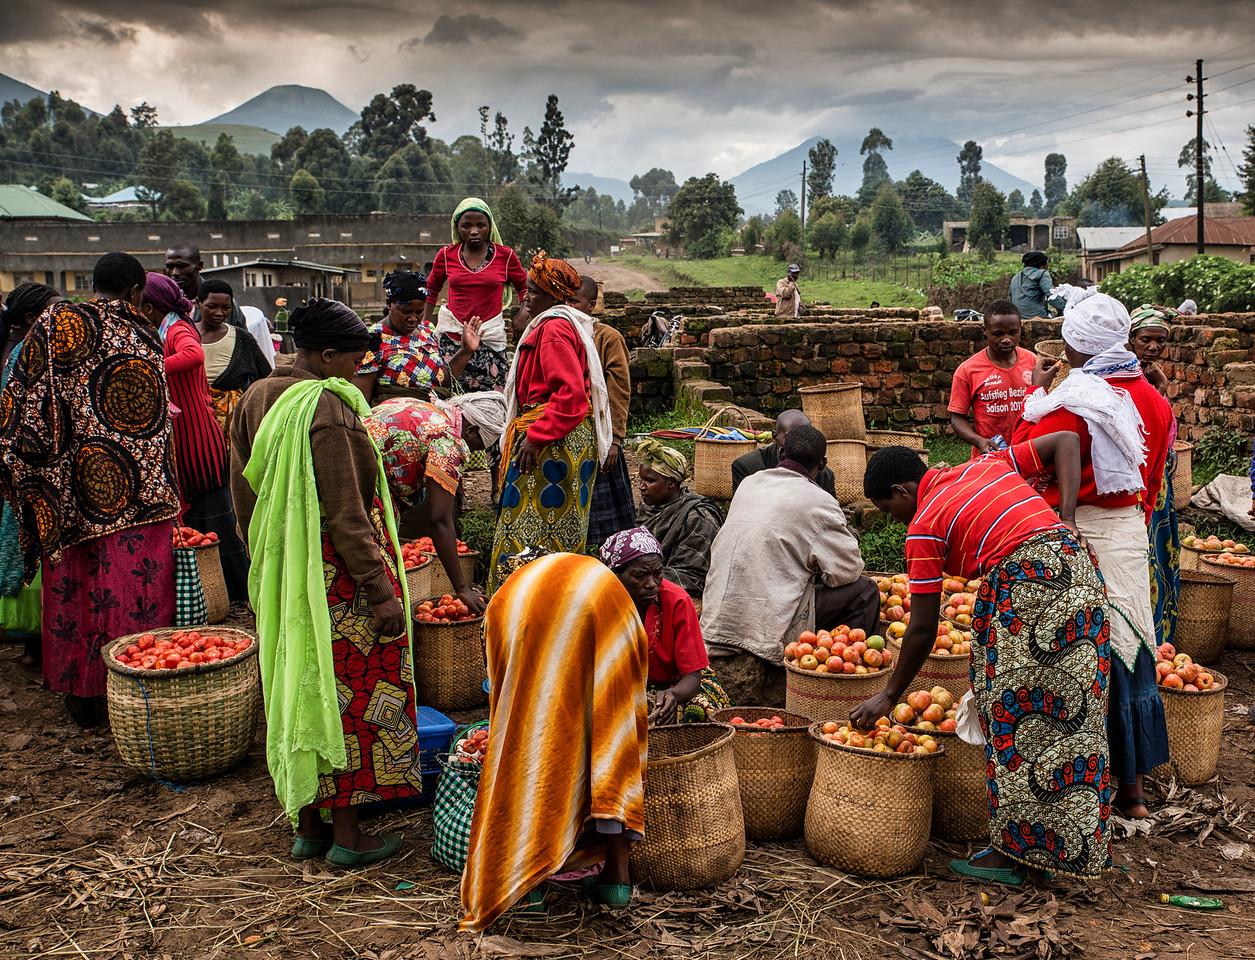 Food market in Kisoro, the volcanoes in the background mark the border with the Democratic Republic of Congo.<br /> <br /> kisoro, Uganda, 2016.